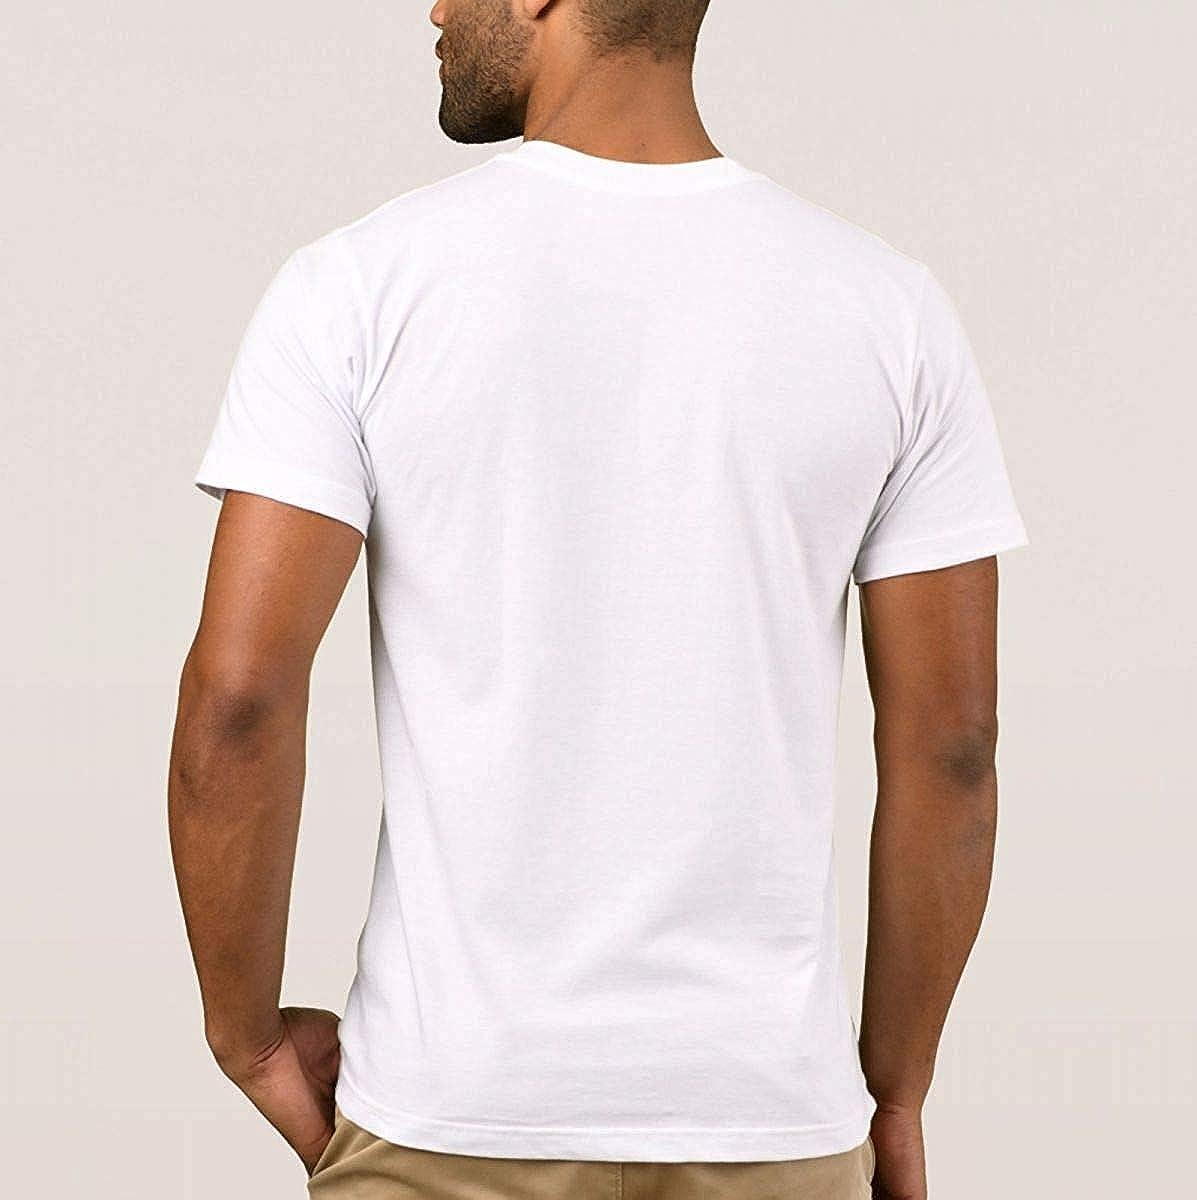 Mens Short-Sleeve Crew Neck Cotton Stretch T-Shirt Big Apple wear Design p PinkX-Large